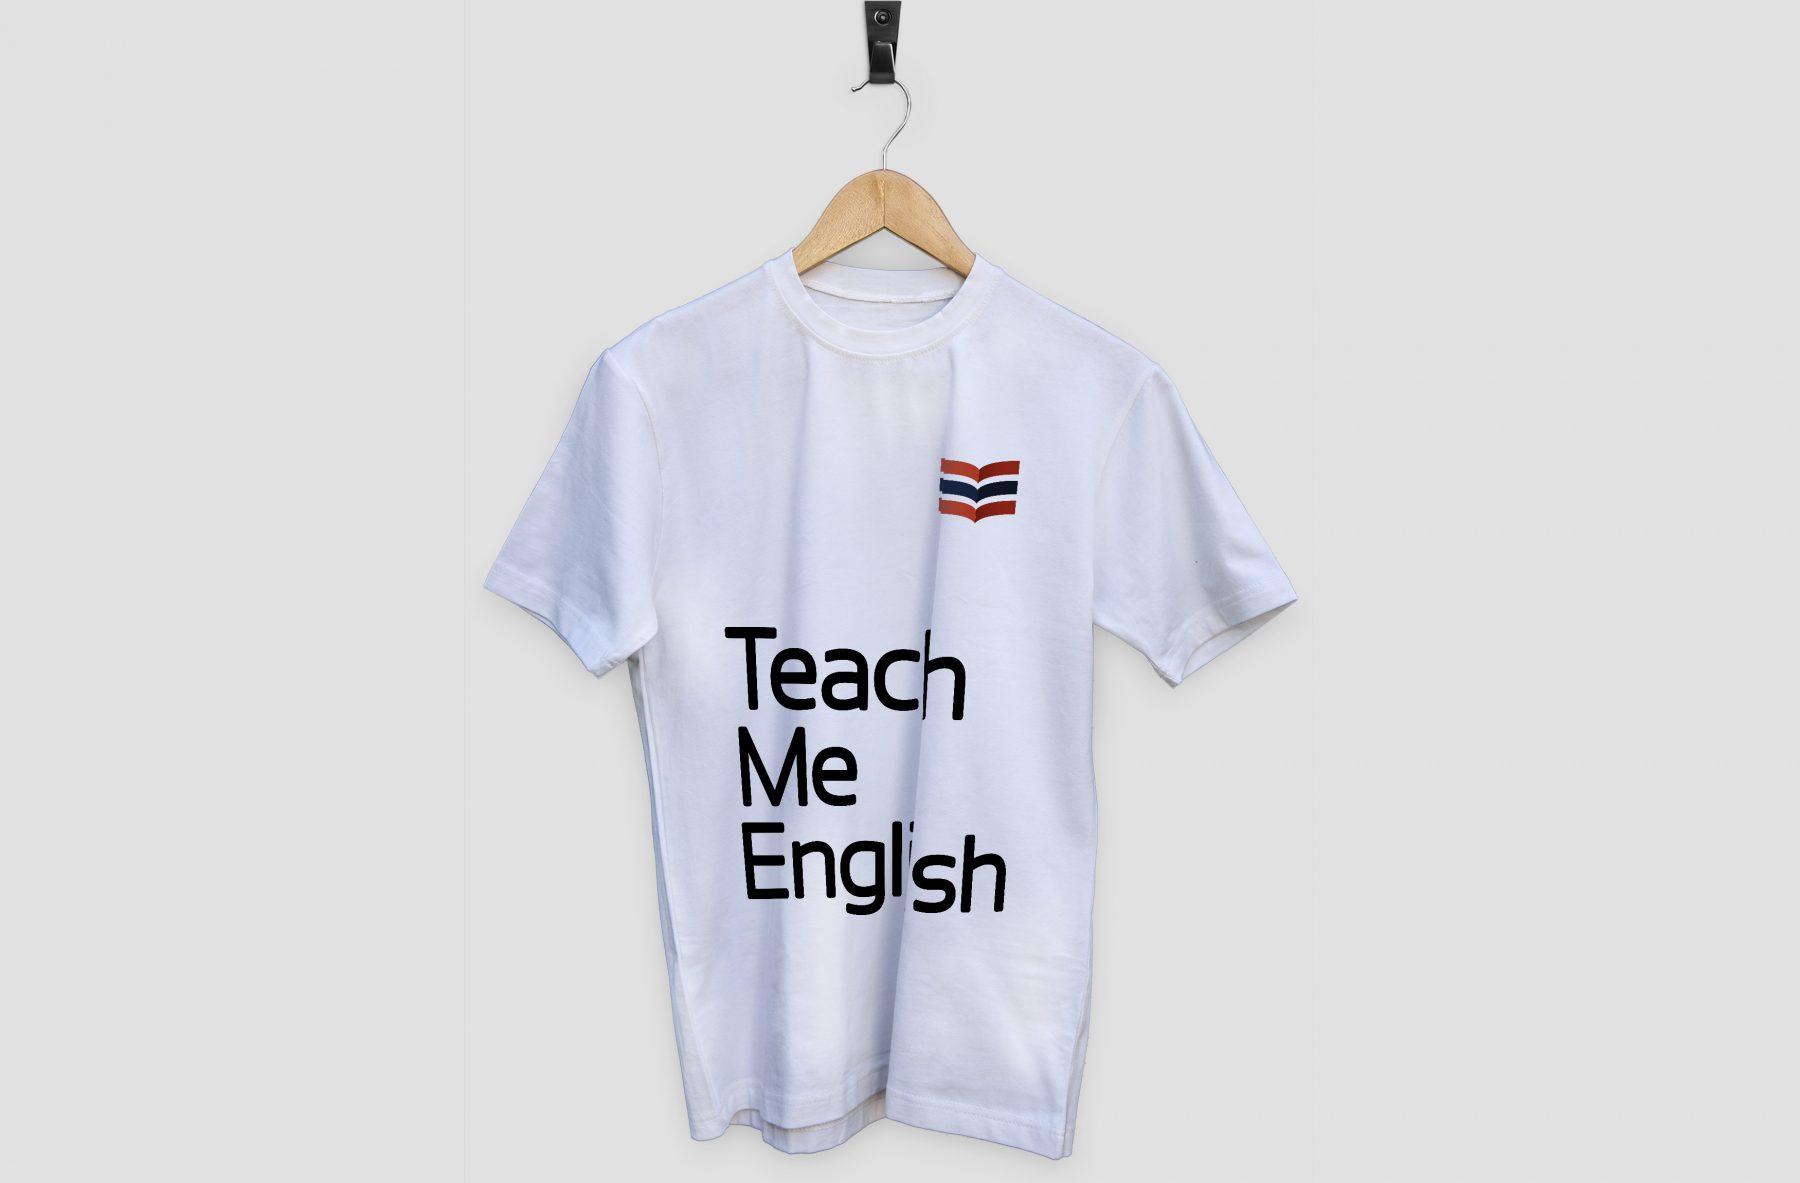 Teach, Me, English, language, centre, student, needs, goals, courses, help, prepare, exams, Bucharest, Alexandra Maria Parvuletu, future, study, work, teacher, job, UK, future, study, abroad